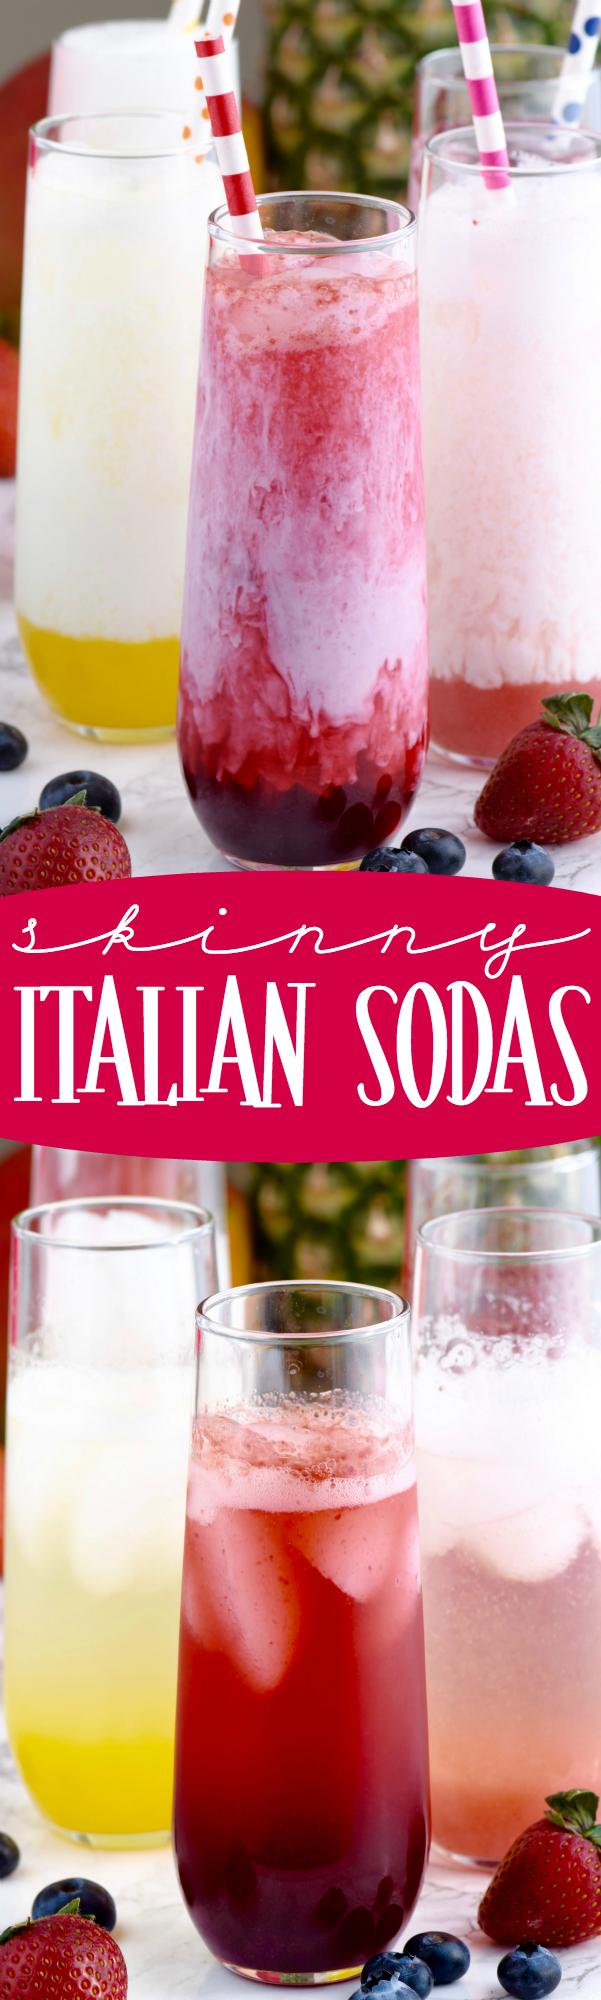 Skinny Italian Sodas | Drinks | Pinterest